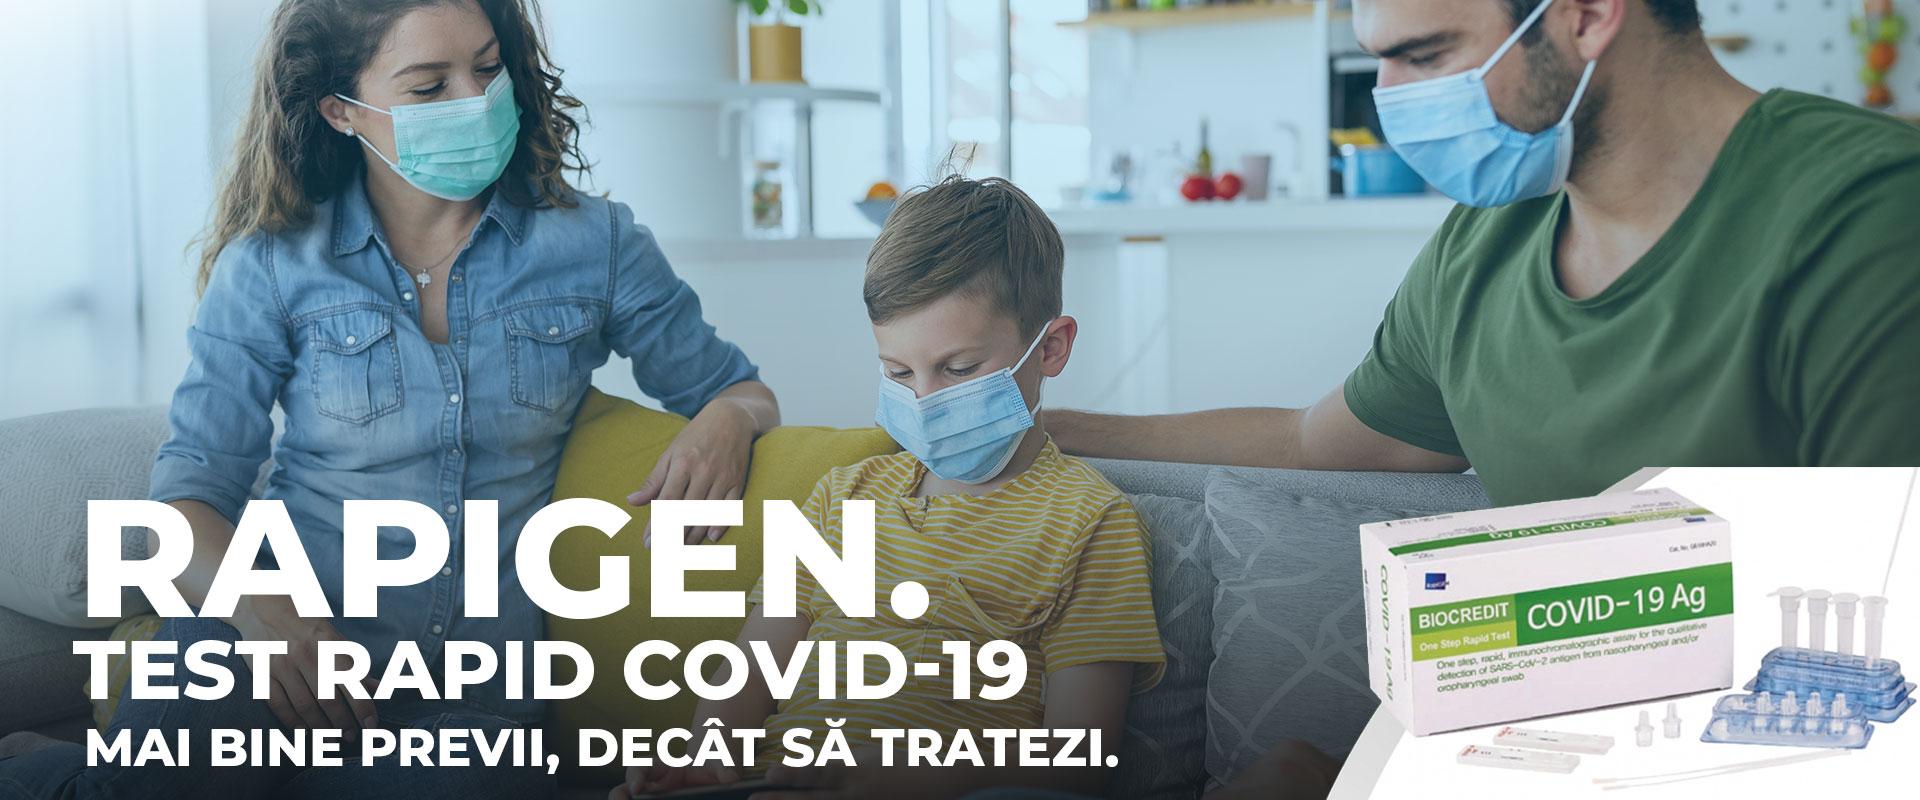 RAPIDGEN TEST RAPID COVID-19